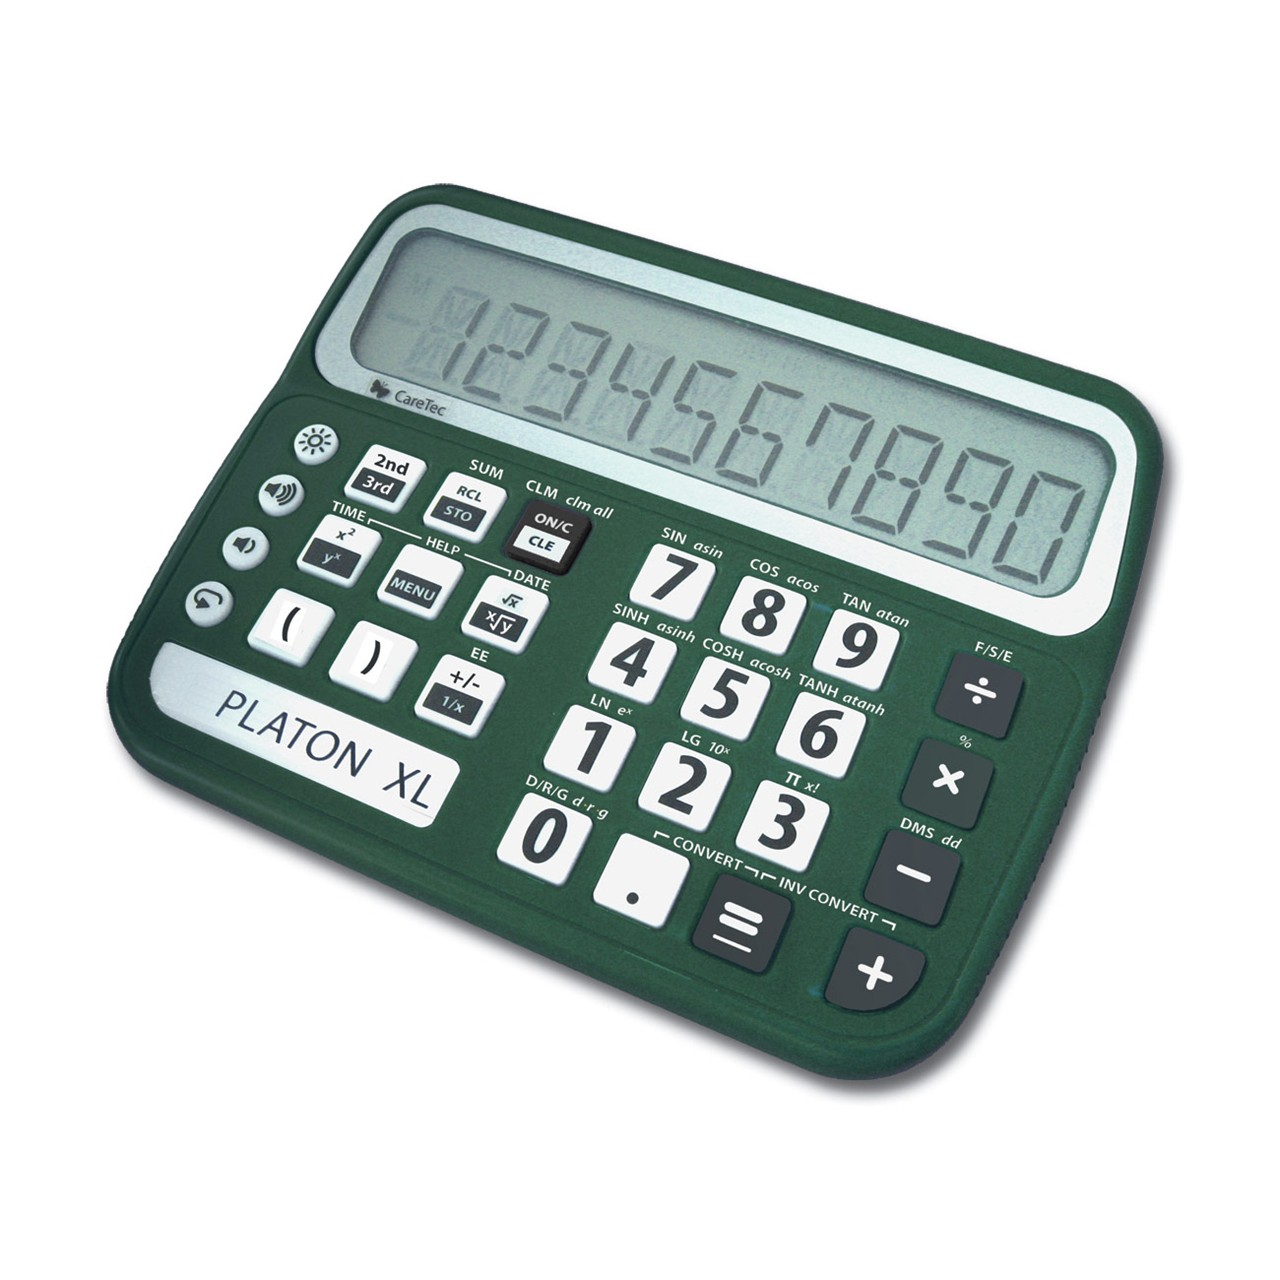 maxiaids platon xl talking low vision scientific calculator